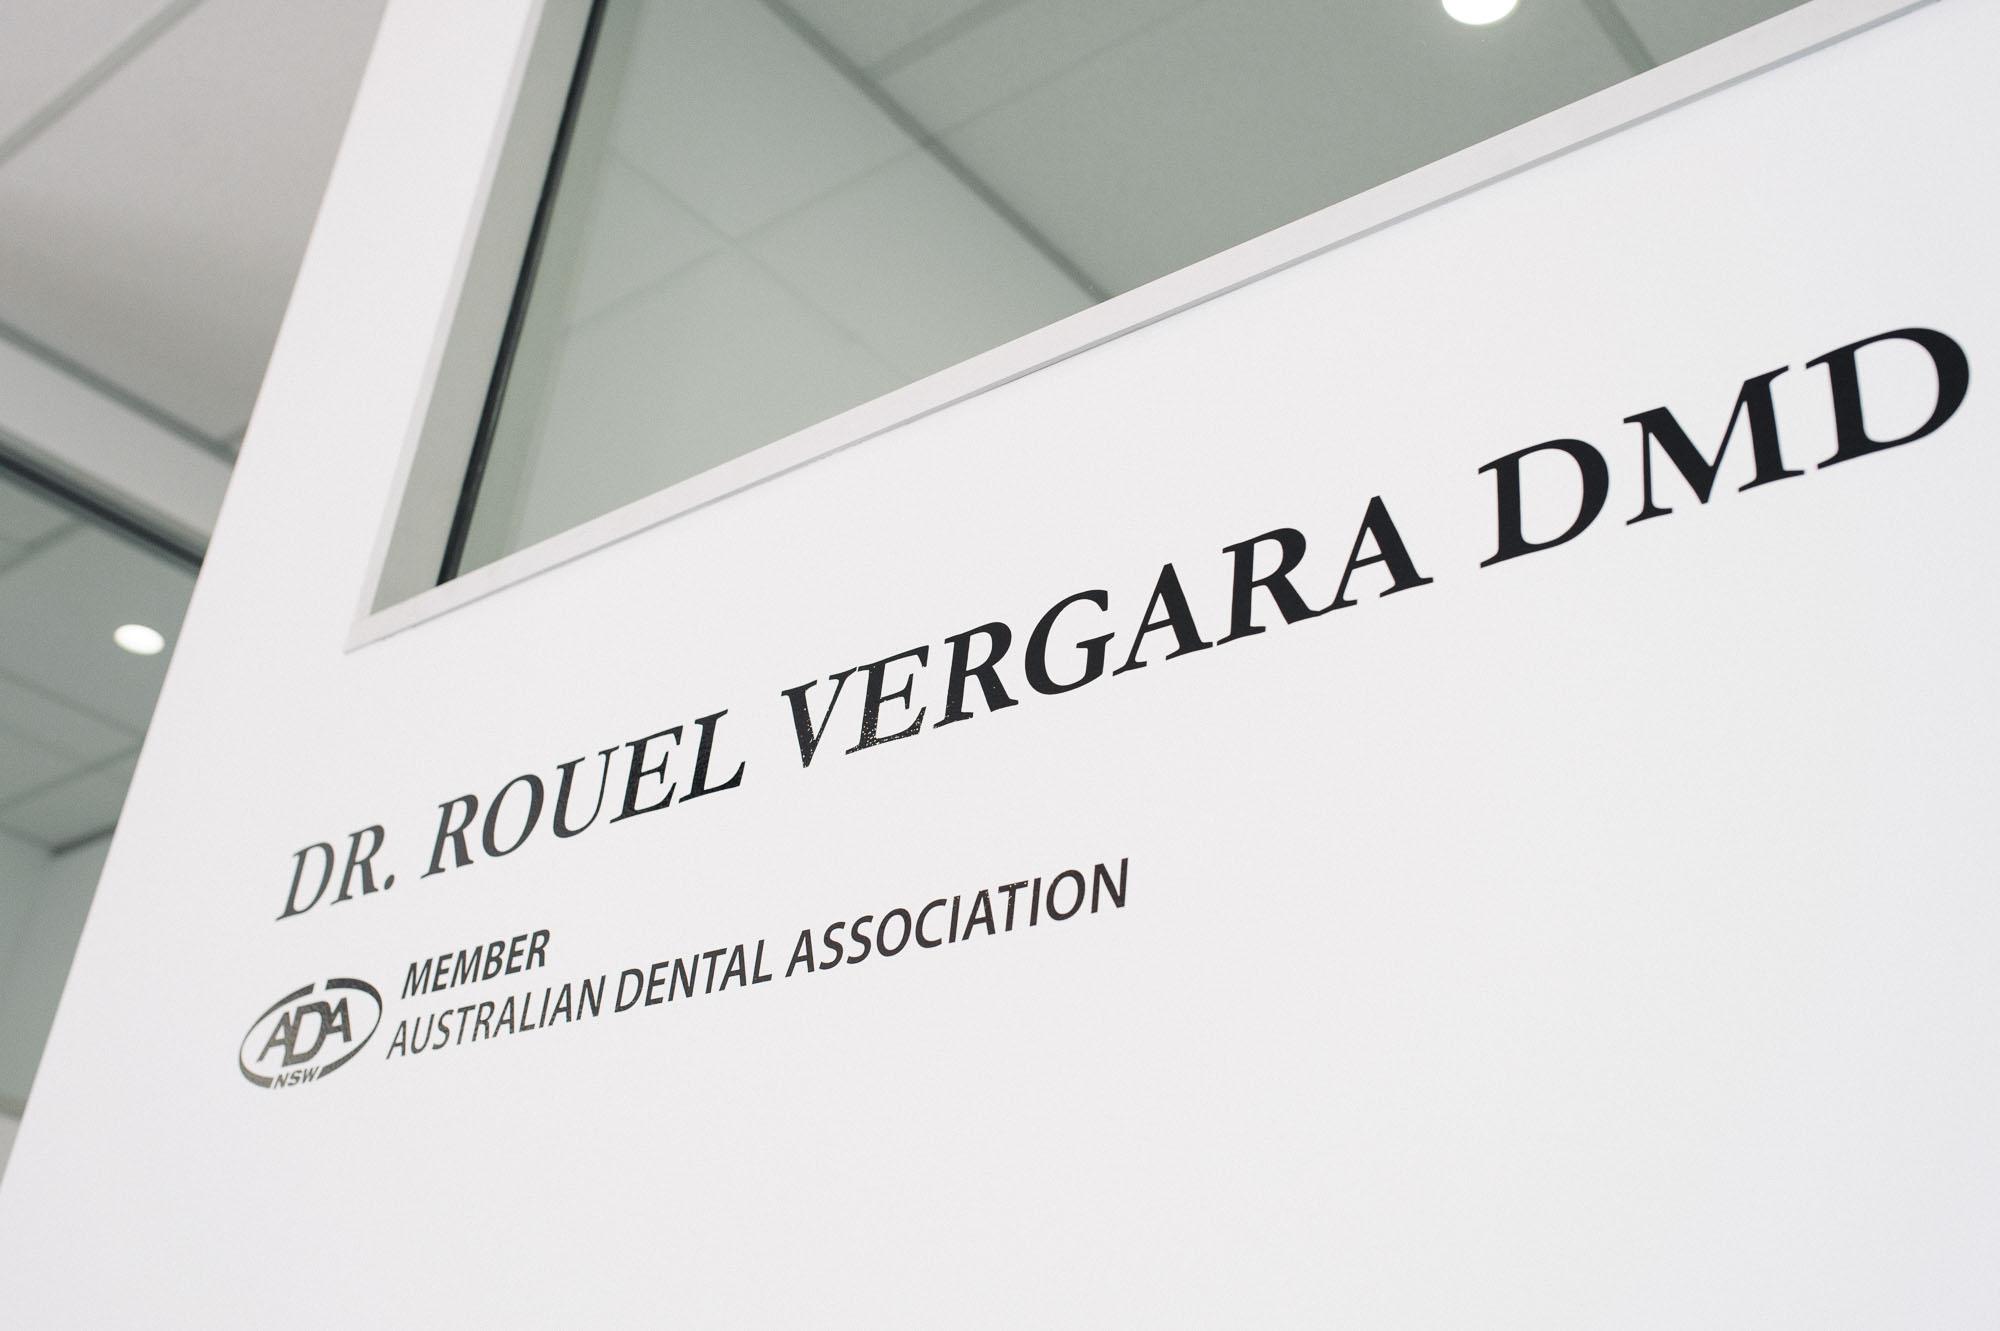 Dr Rouel Vergara DMD-dental solutions in Central Coast